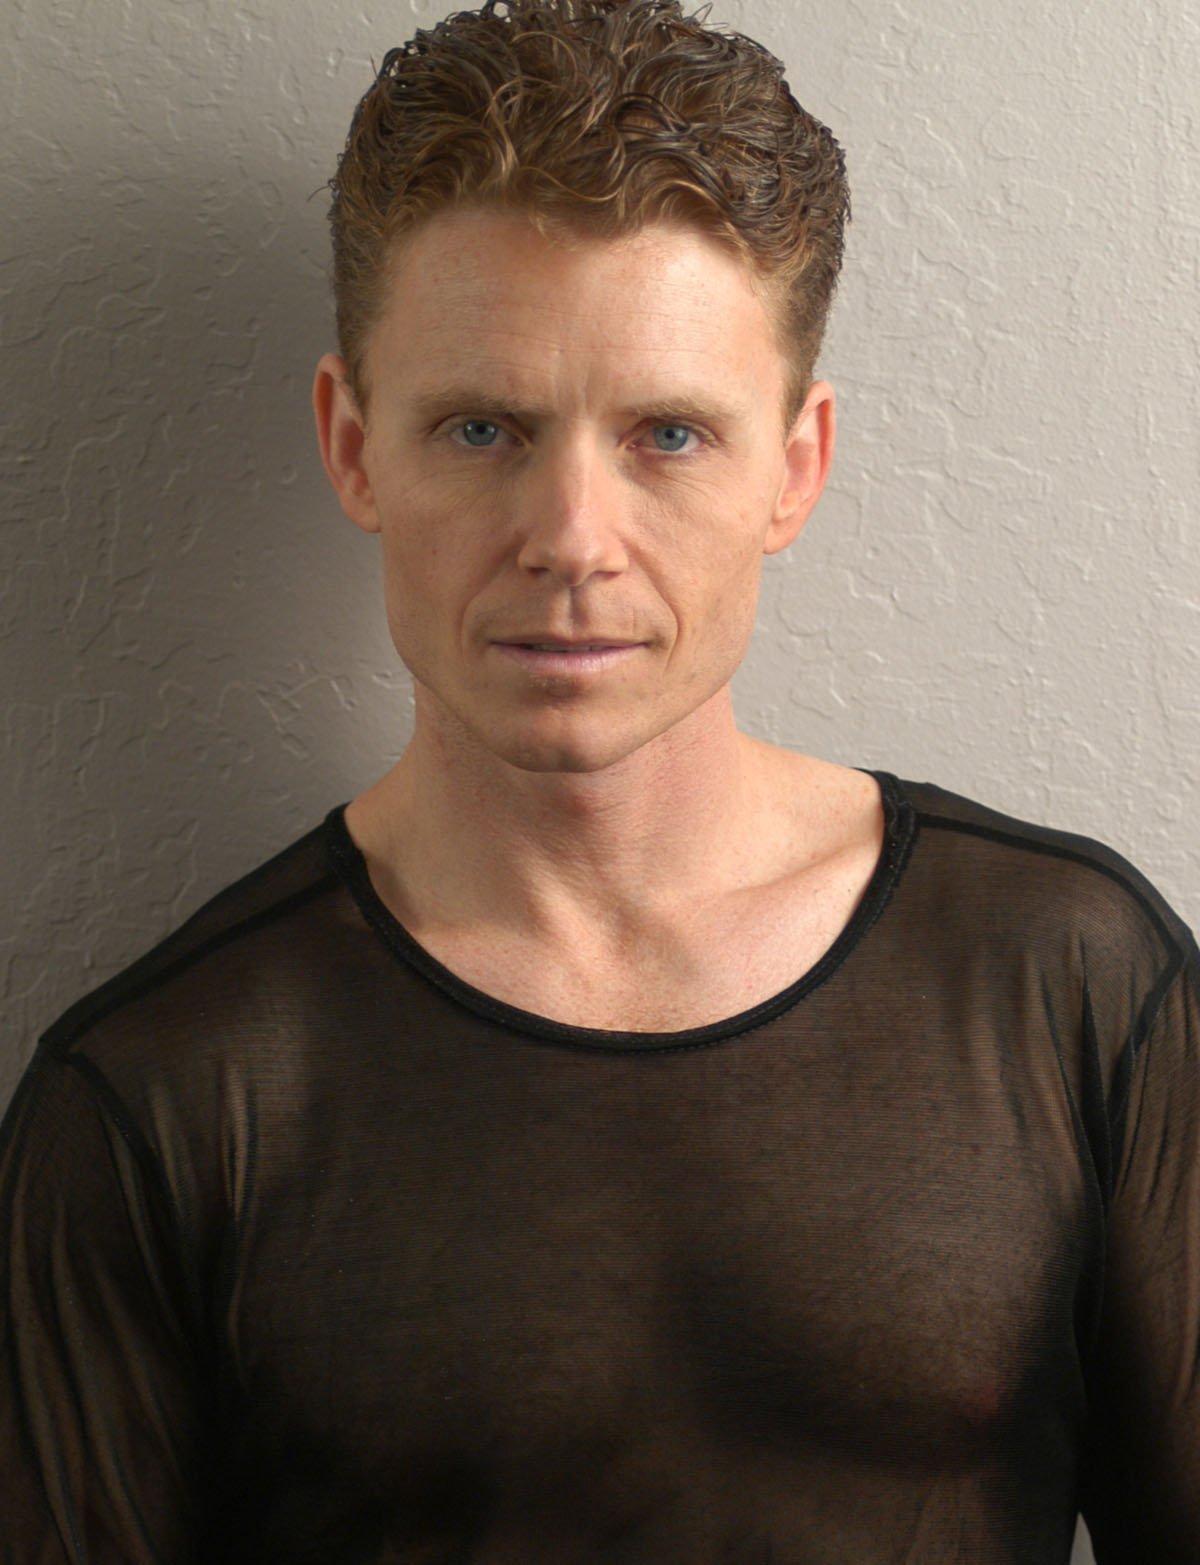 Tytus Bergstrom